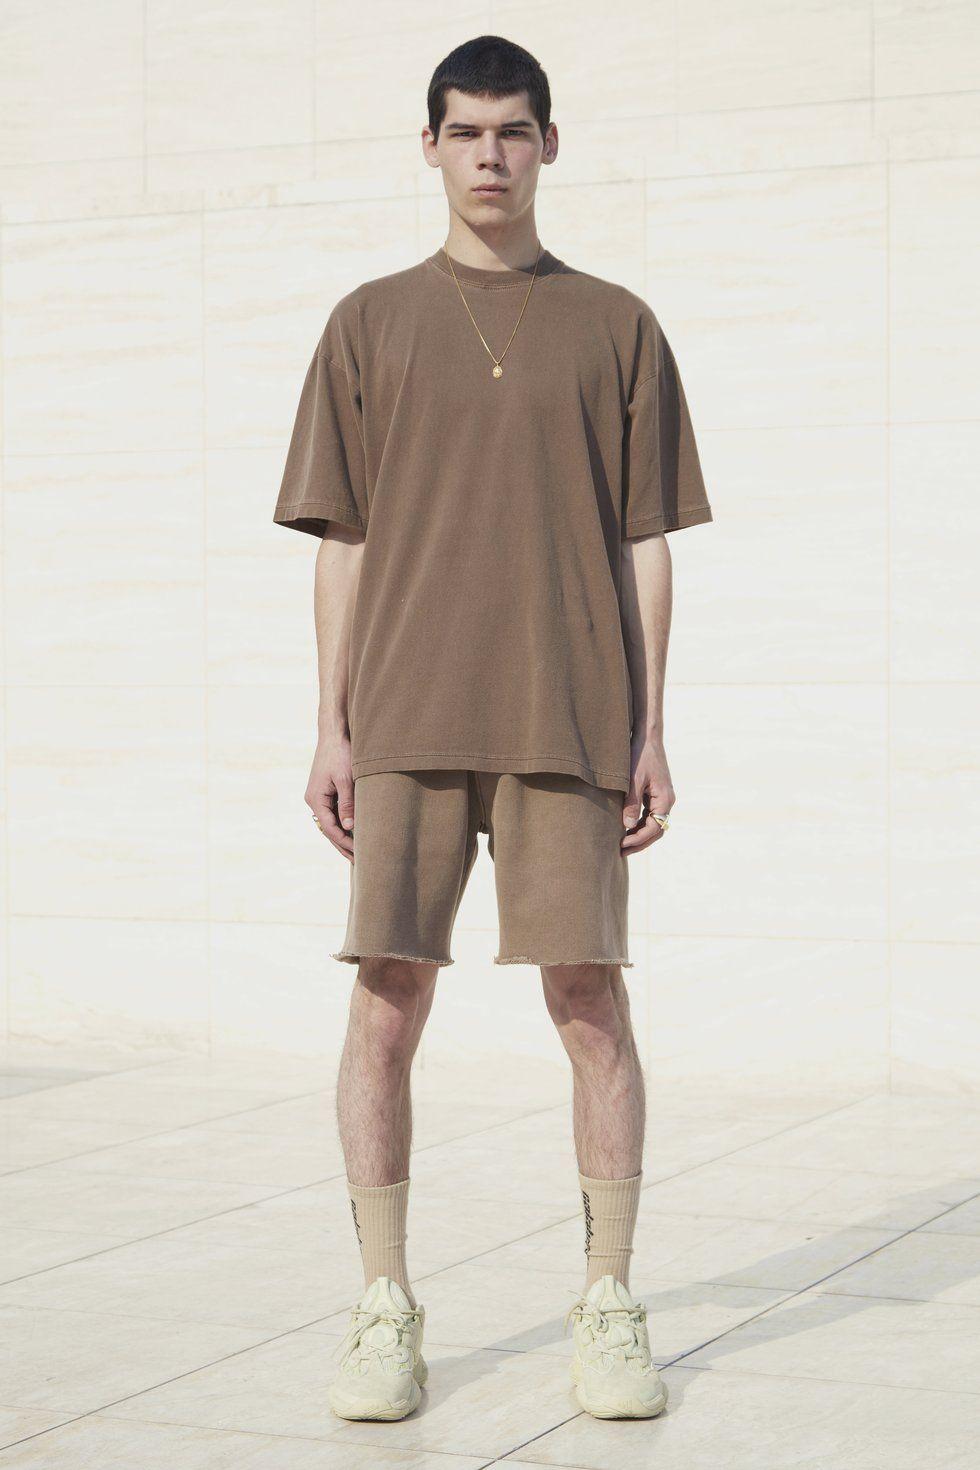 SWEATSHORTS HILLS   Yeezy outfit, Yeezy t shirt, Yeezy fashion